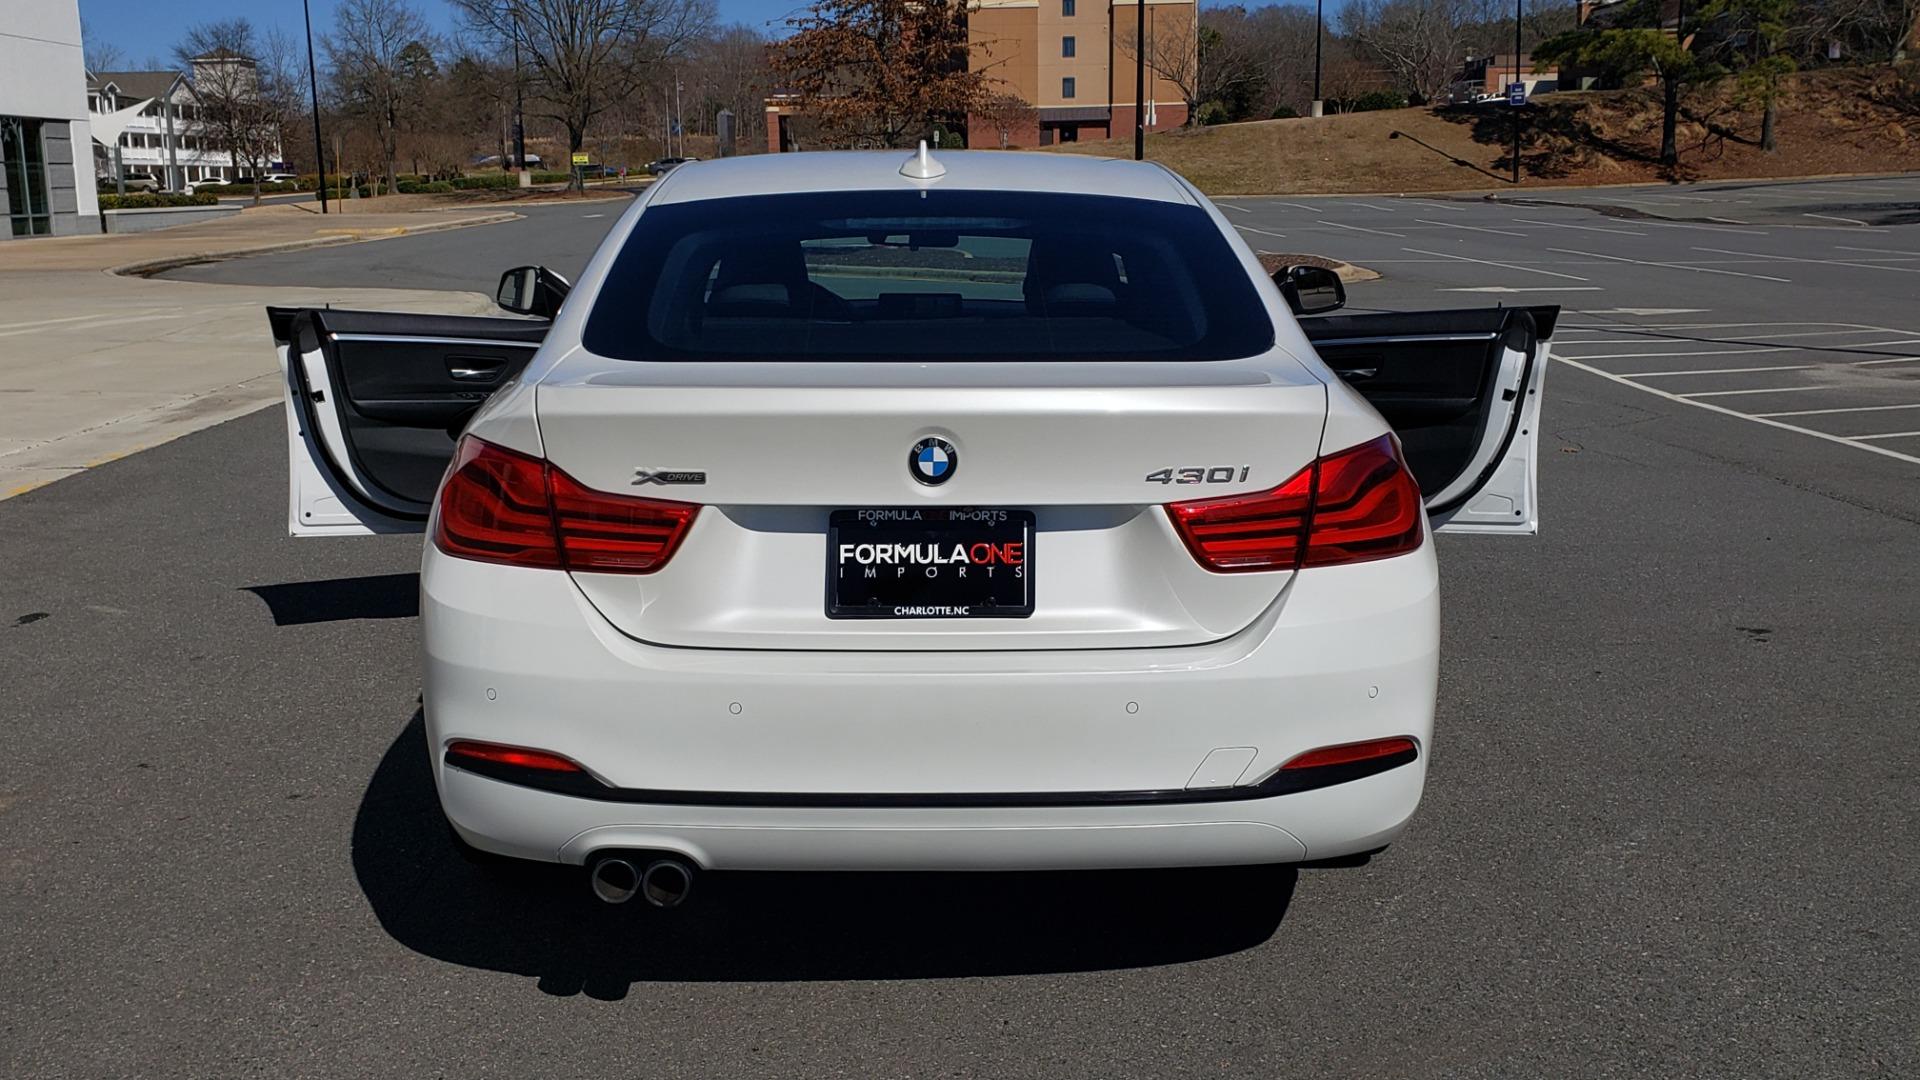 Used 2018 BMW 4 SERIES 430IXDRIVE / PREMIUM / NAV / SUNROOF / ESSENTIALS PKG for sale $27,795 at Formula Imports in Charlotte NC 28227 21